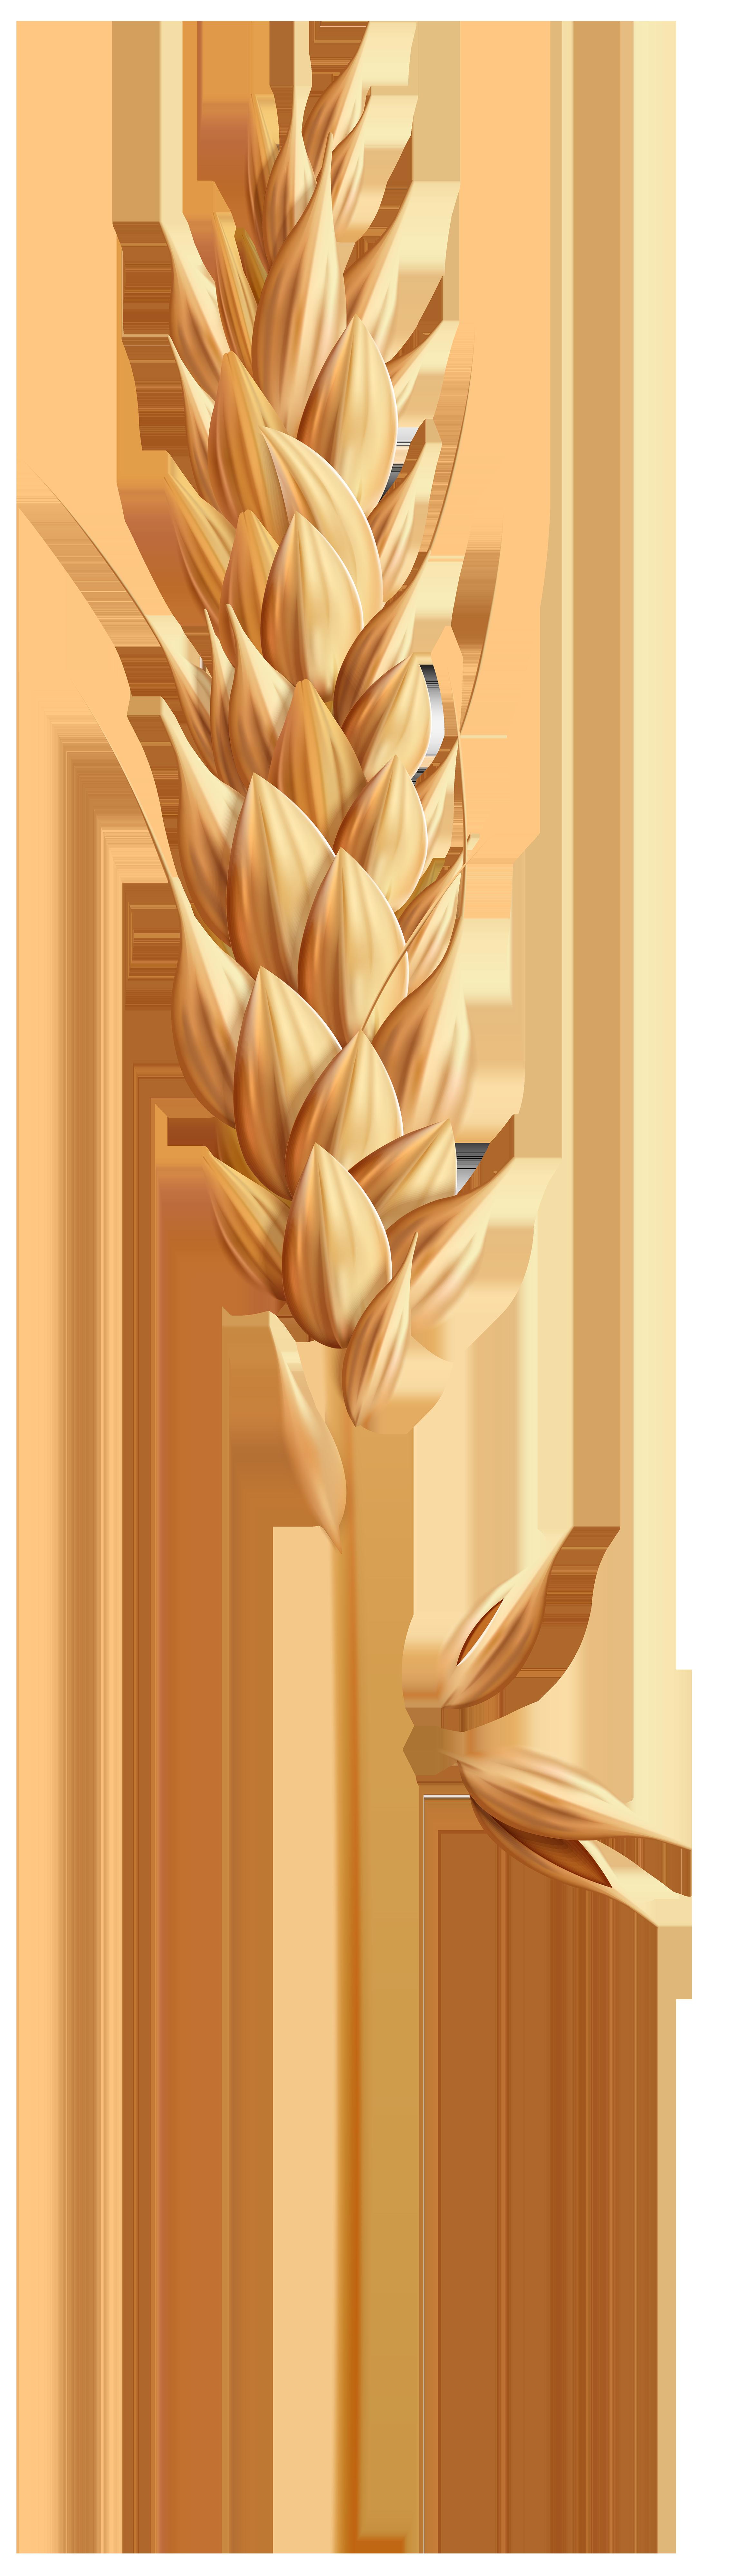 Wheat Grain PNG Clip Art Image.